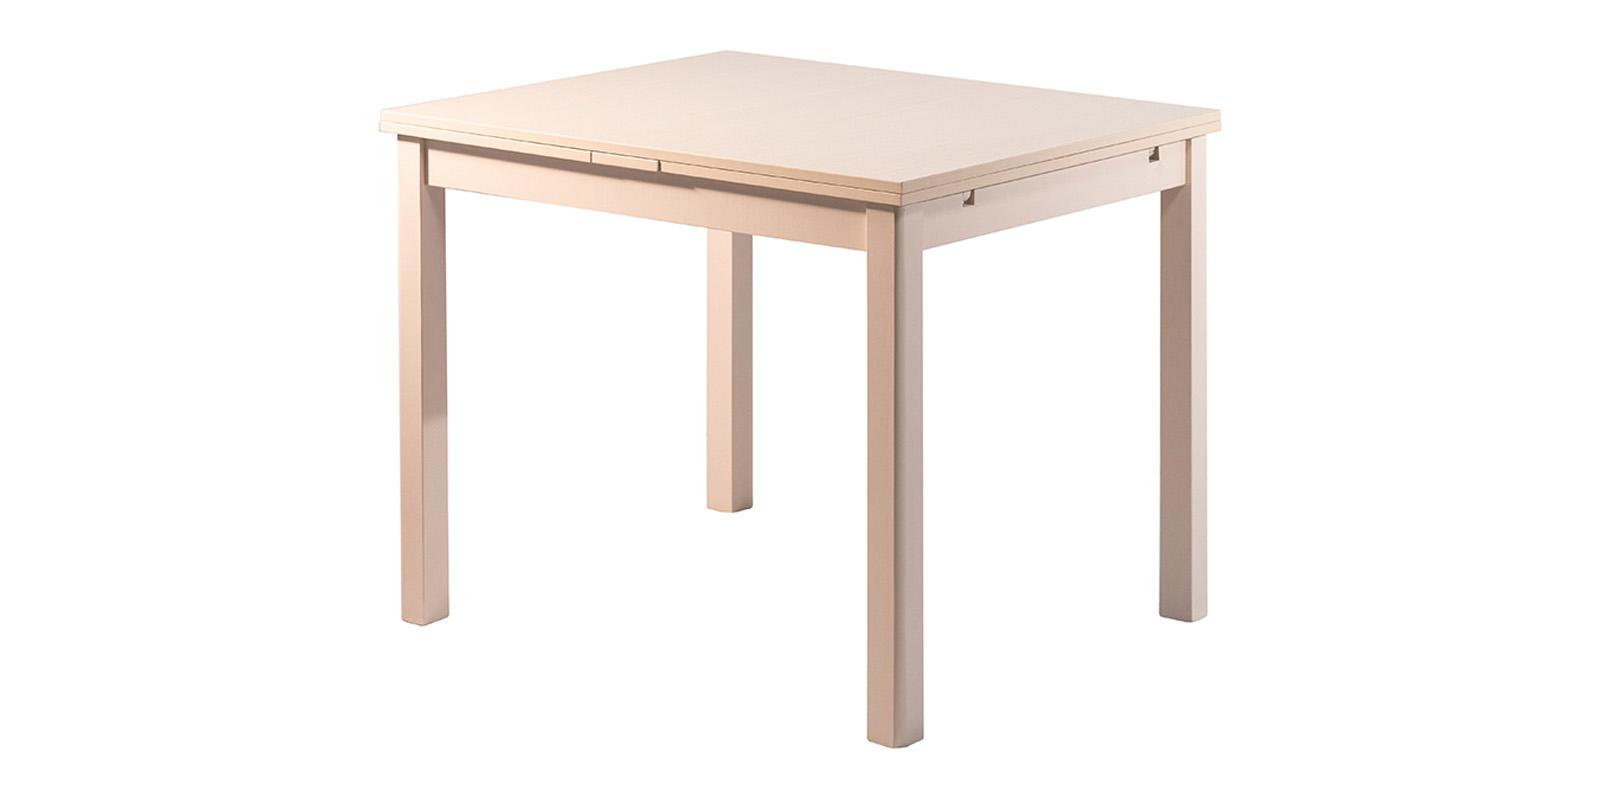 Кухонный стол HomeMe Франц от Homeme.ru